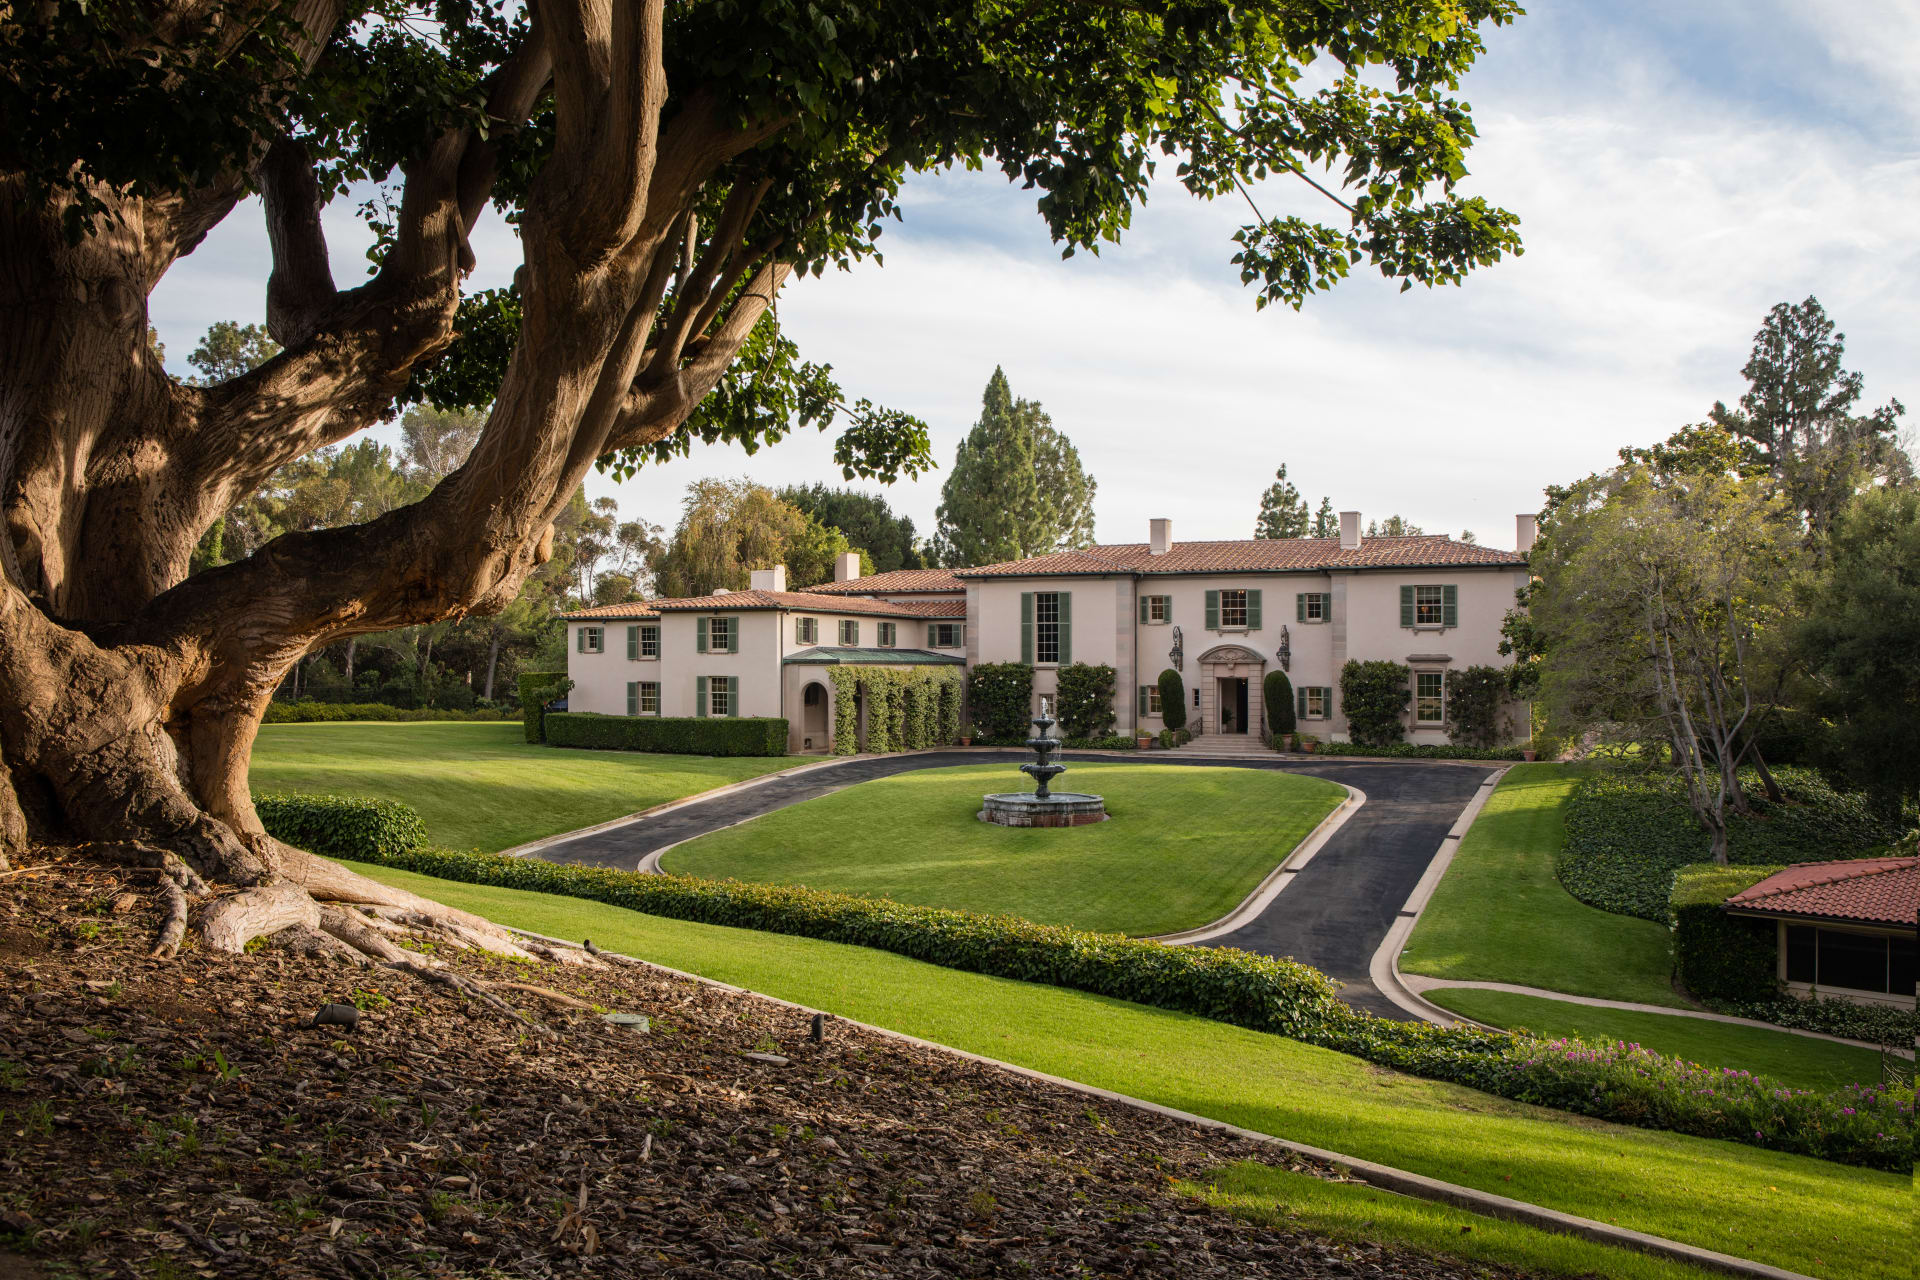 The Owlwood Estate